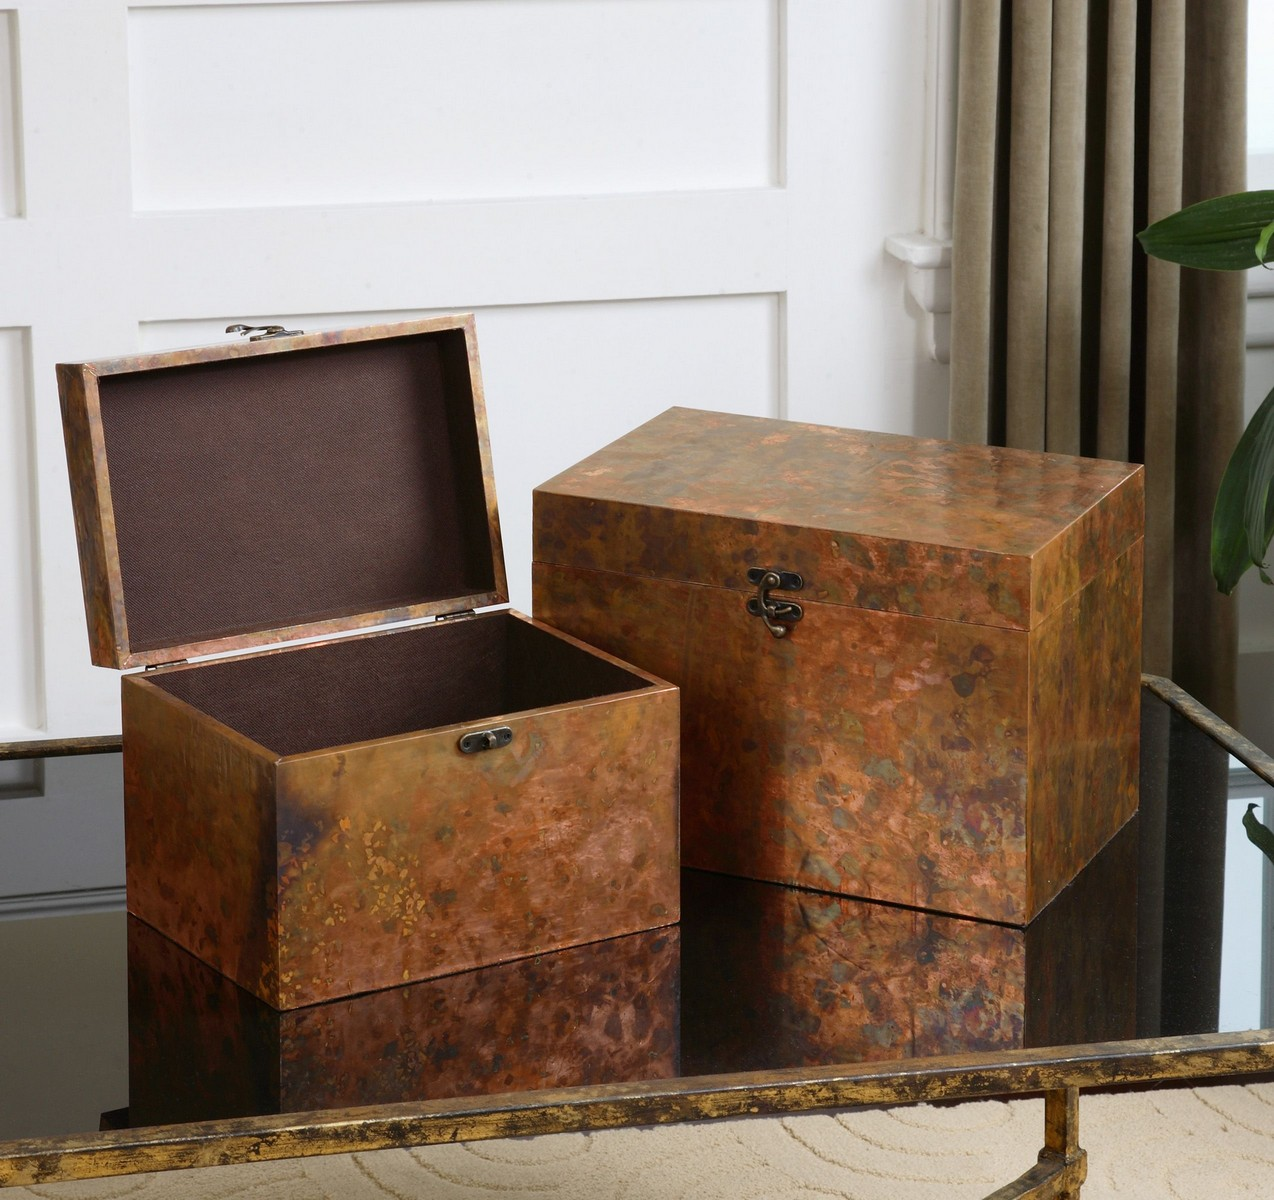 Uttermost Ambrosia Copper Boxes - Set of 2